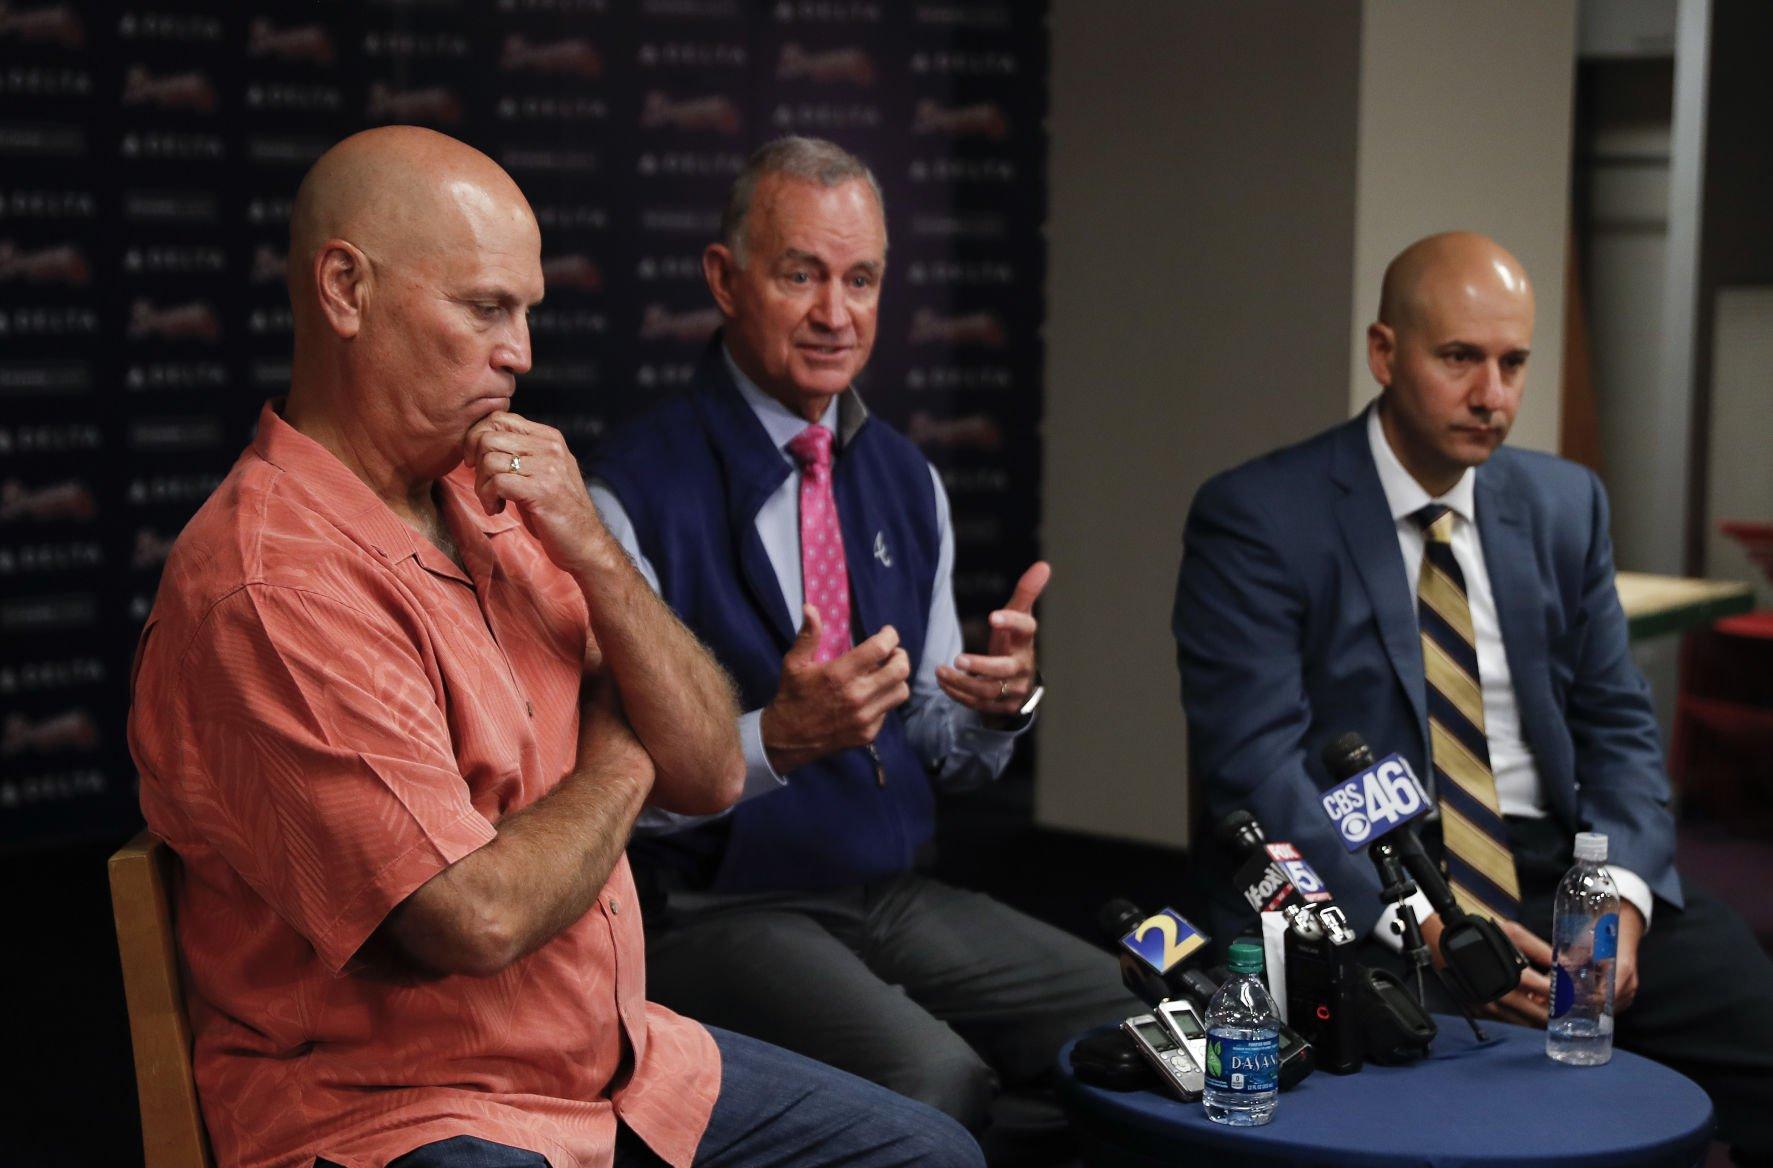 Stunner: Coppolella resigns as Braves General Manager